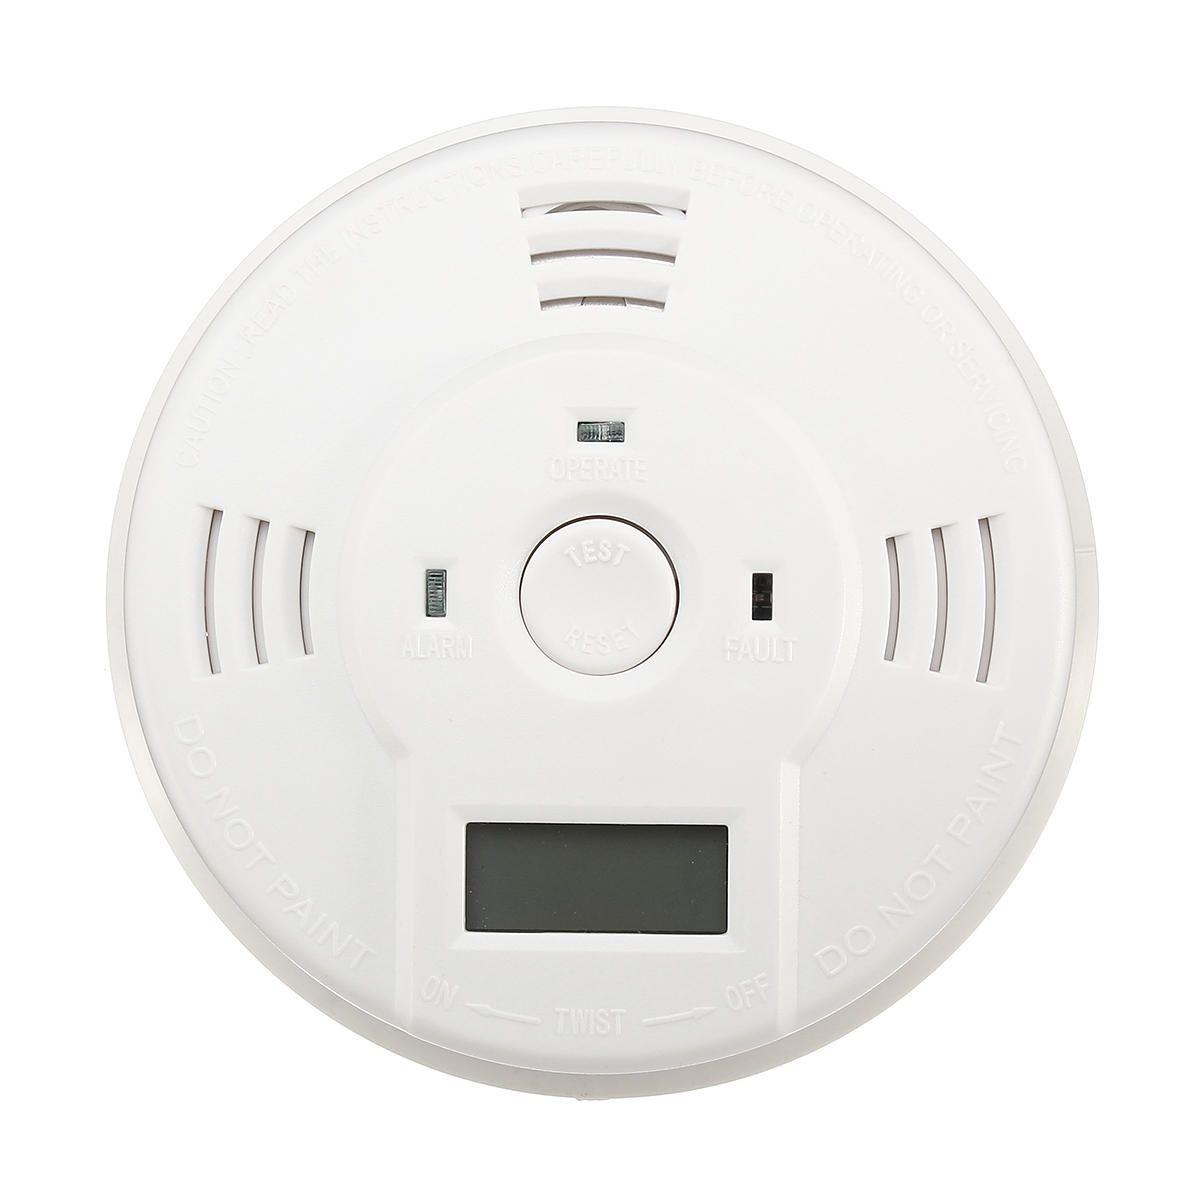 LCD CO Carbon Smoke Monoxide Poisoning Sensor Alarm Gas Warning Detector Voice